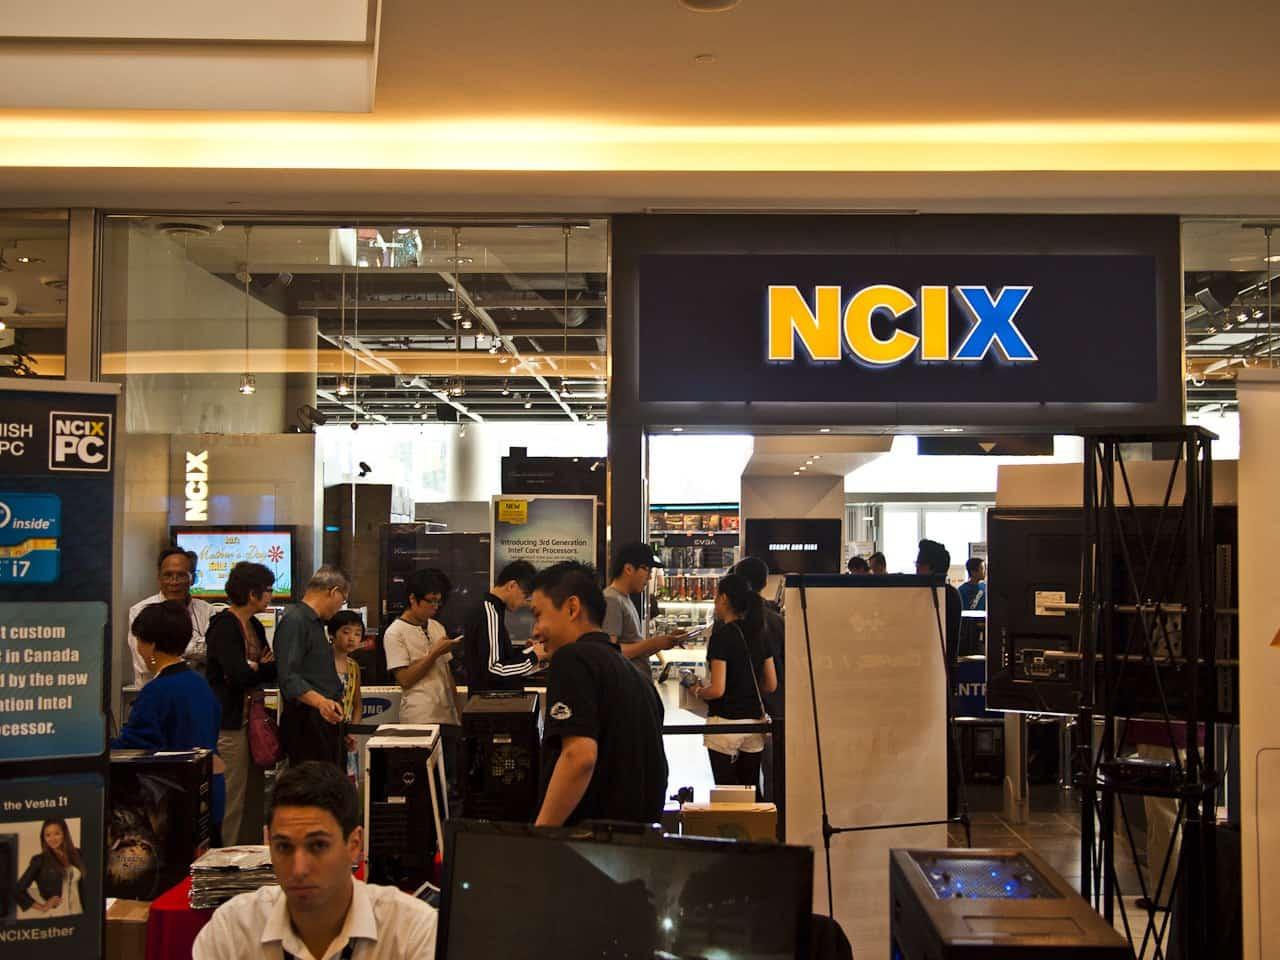 The 1st Annual NCIX Tech Fair - It's a New PC Renaissance In Western Canada!